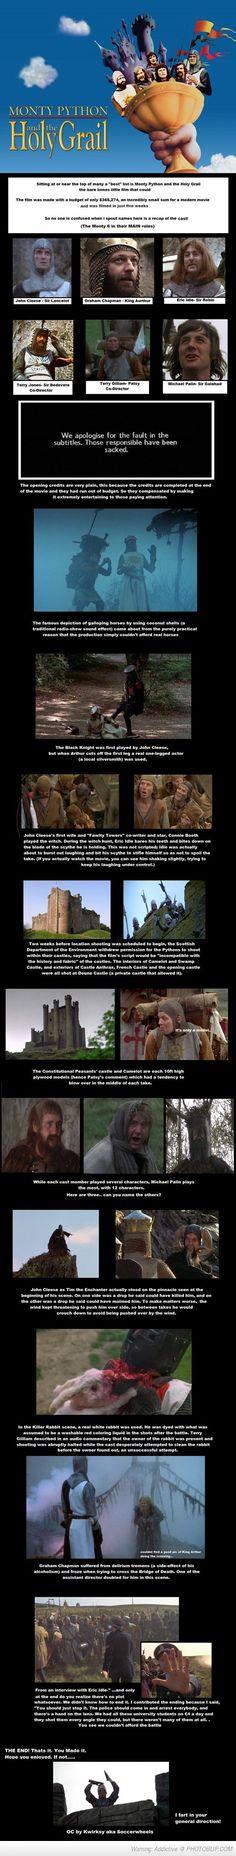 Monty Python Facts